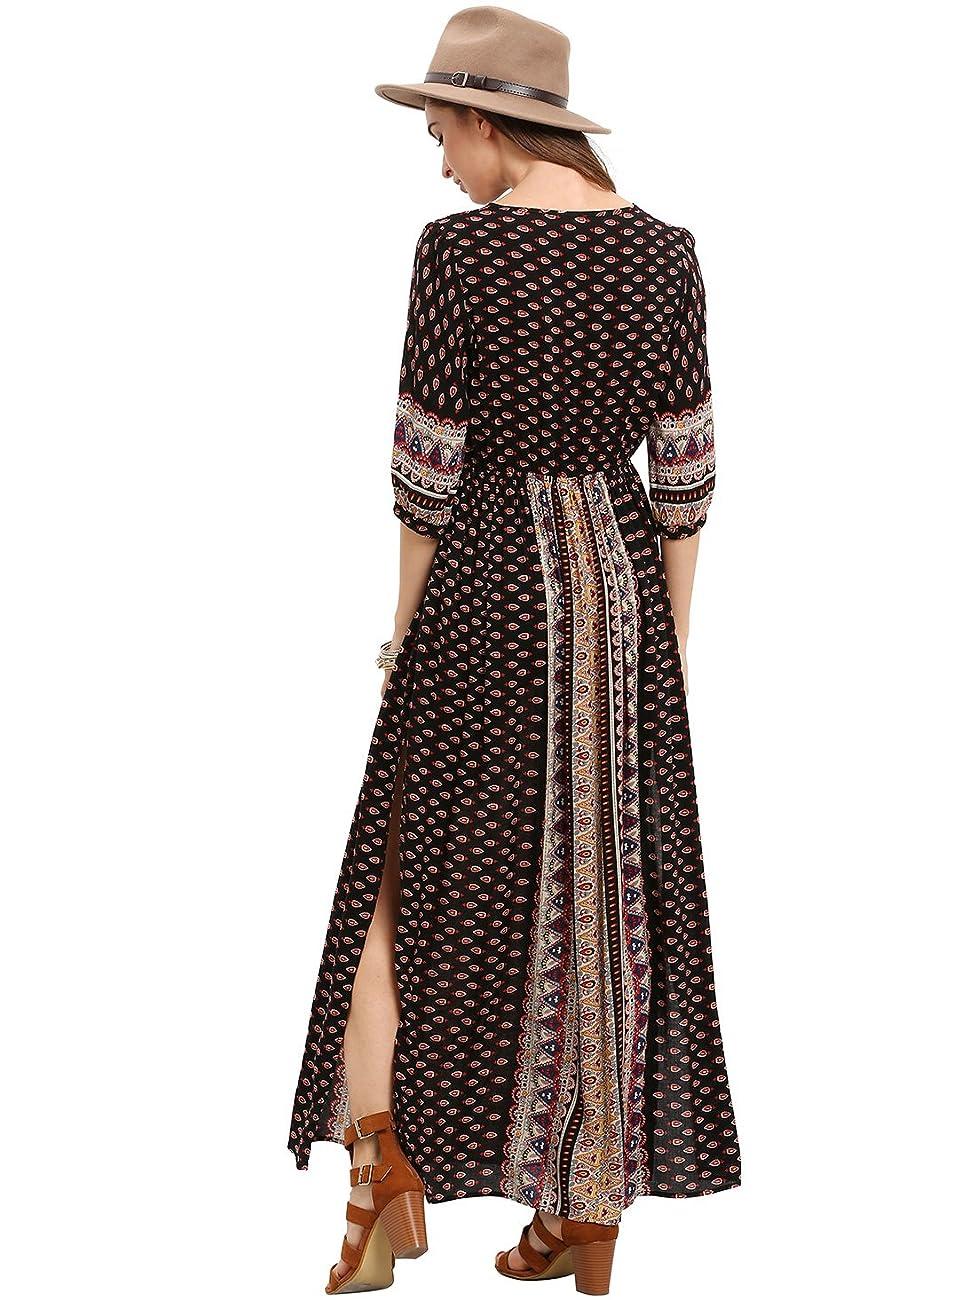 ROMWE Women's Summer Casual Half Sleeve Vintage Print Split Maxi Dress 4